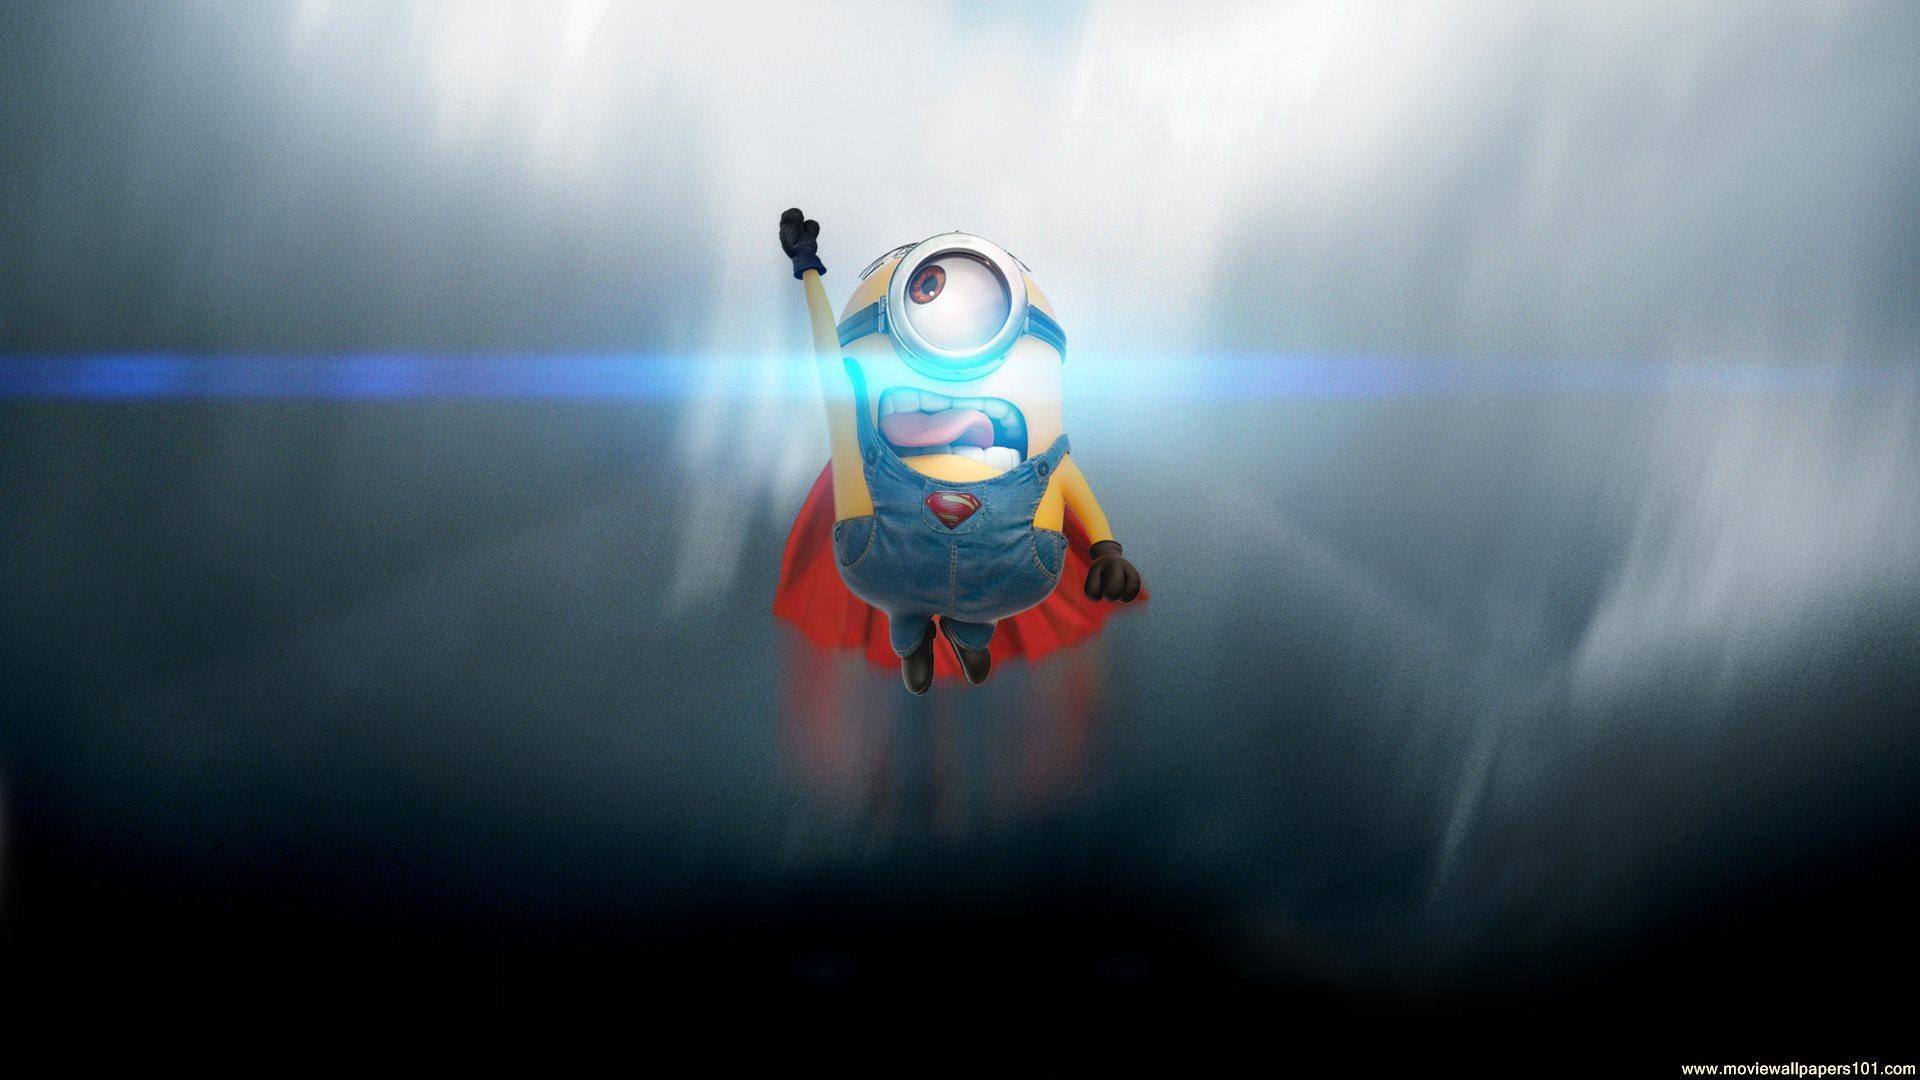 Minions 2015 Movie The Superman HD Wallpaper   StylishHDWallpapers 1920x1080